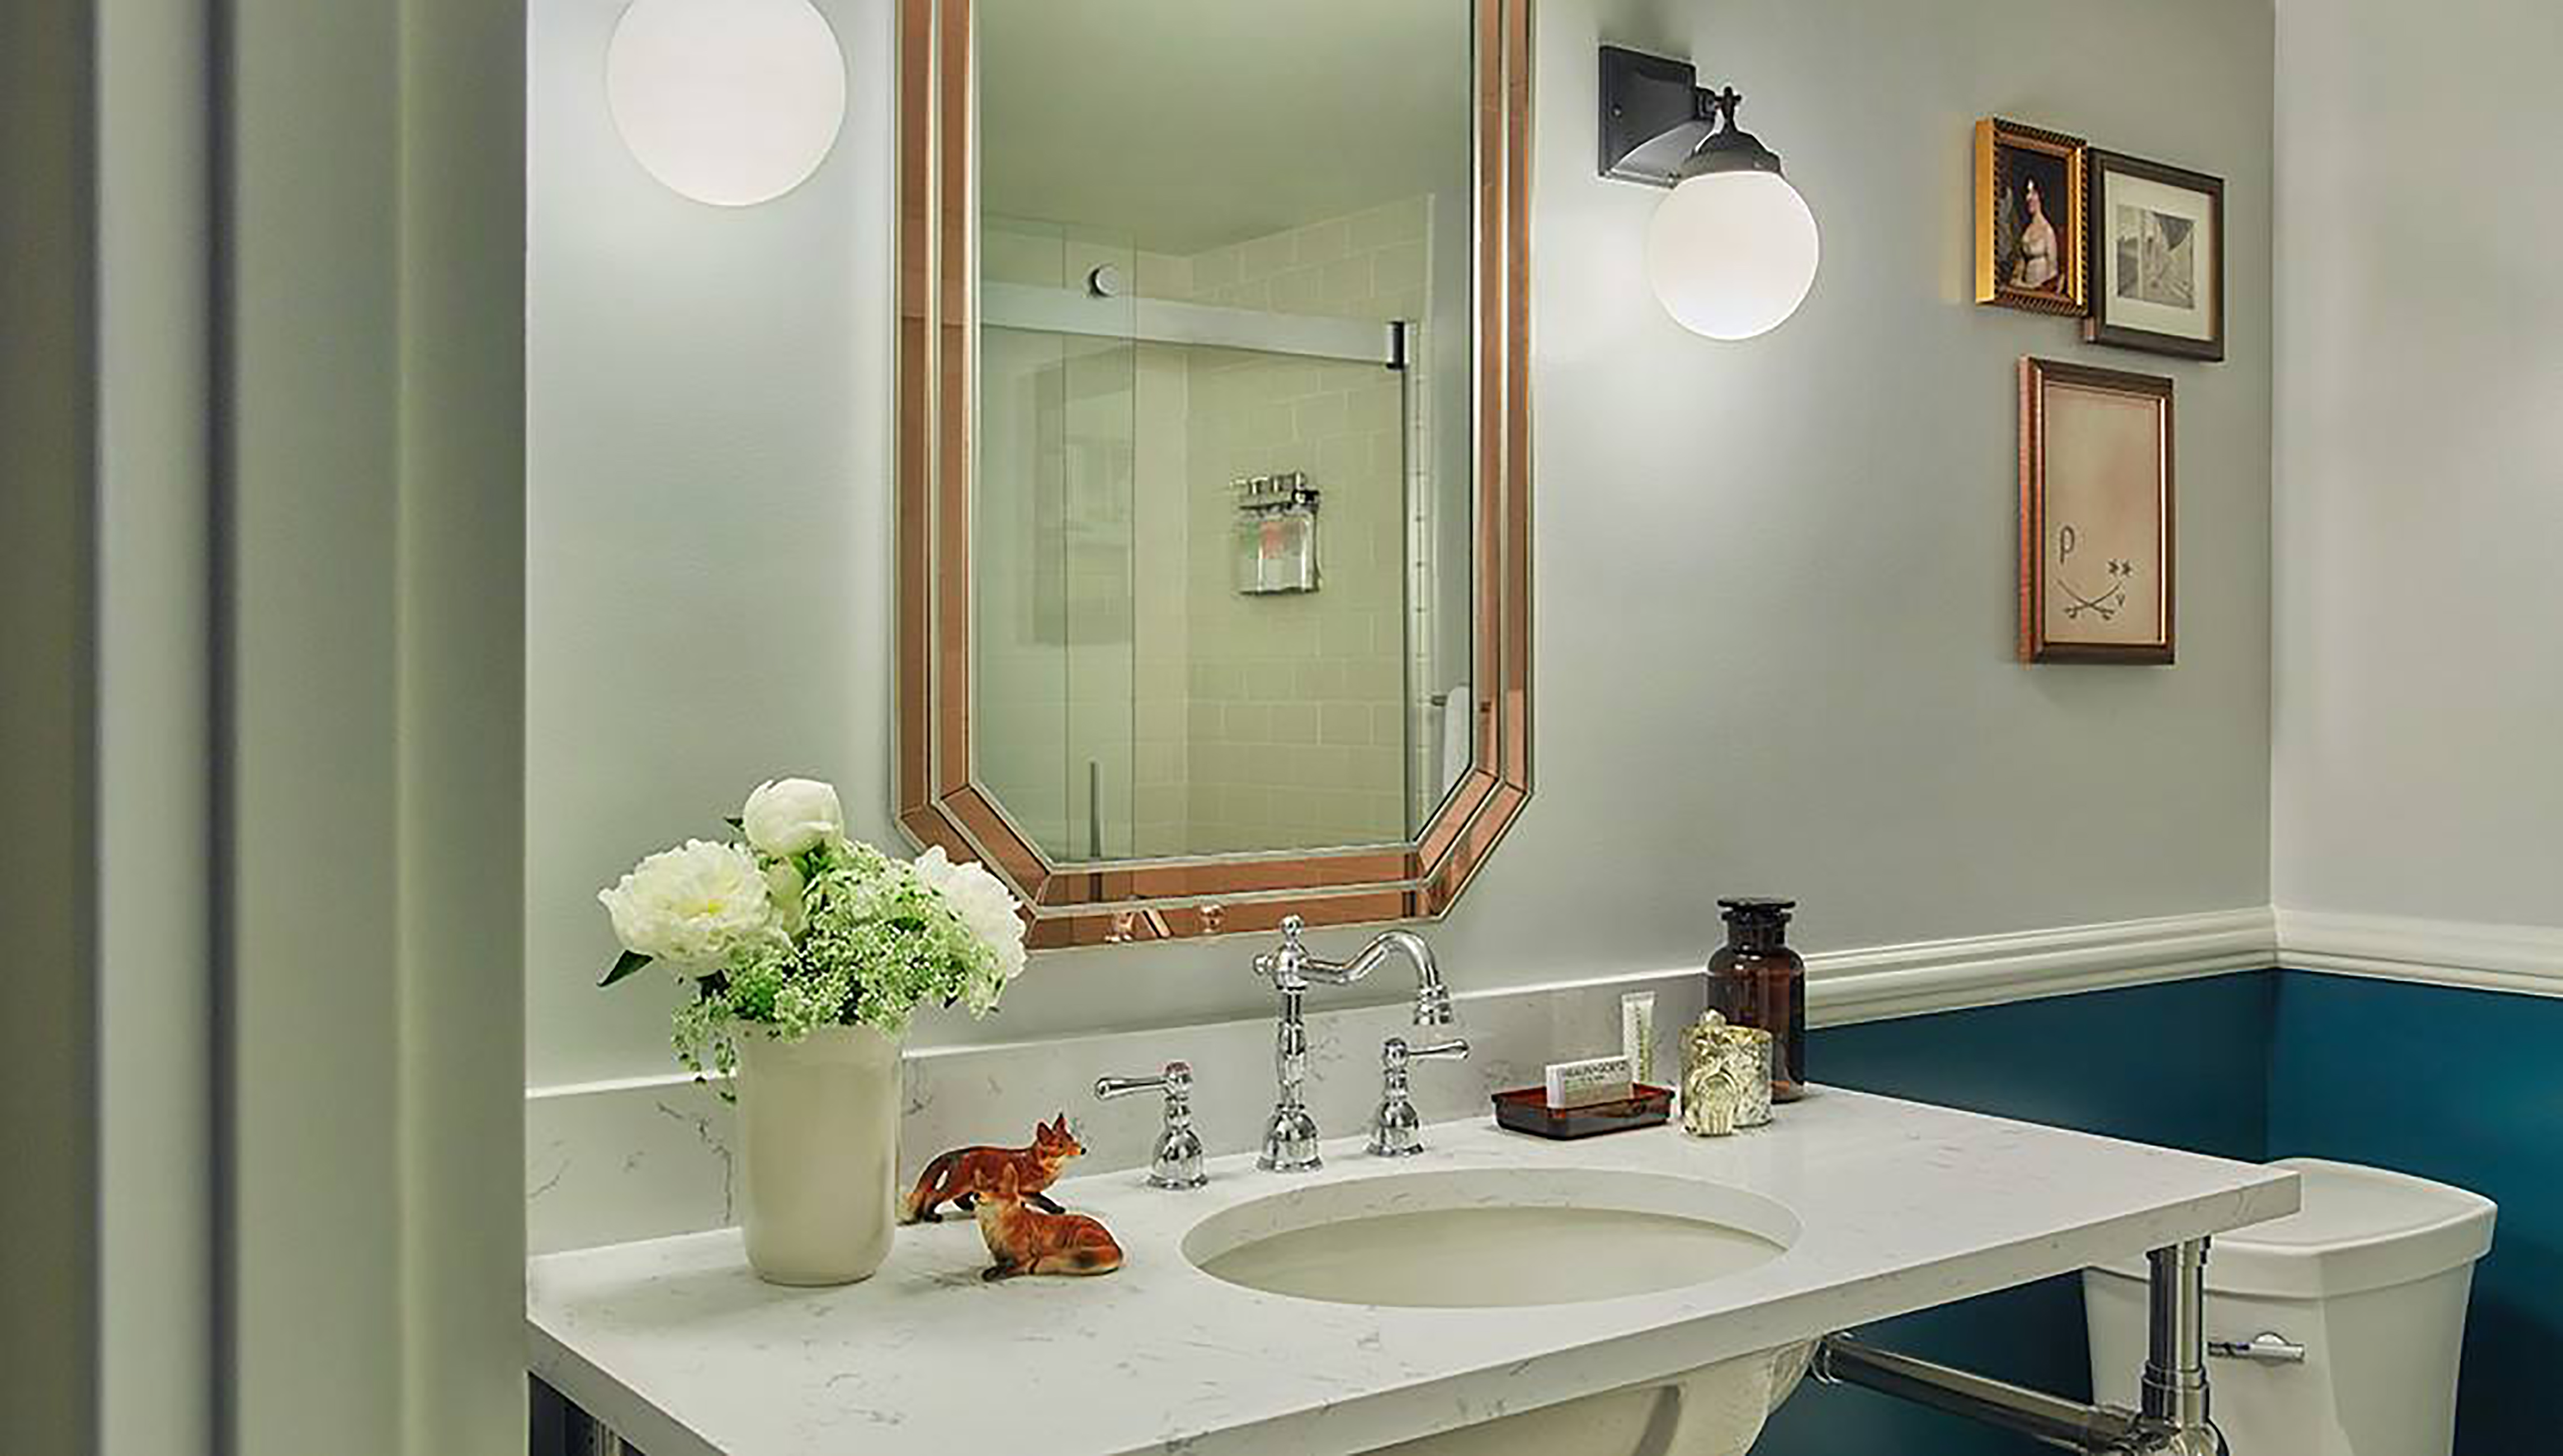 mirror image hospitality arnold hospitality. Black Bedroom Furniture Sets. Home Design Ideas